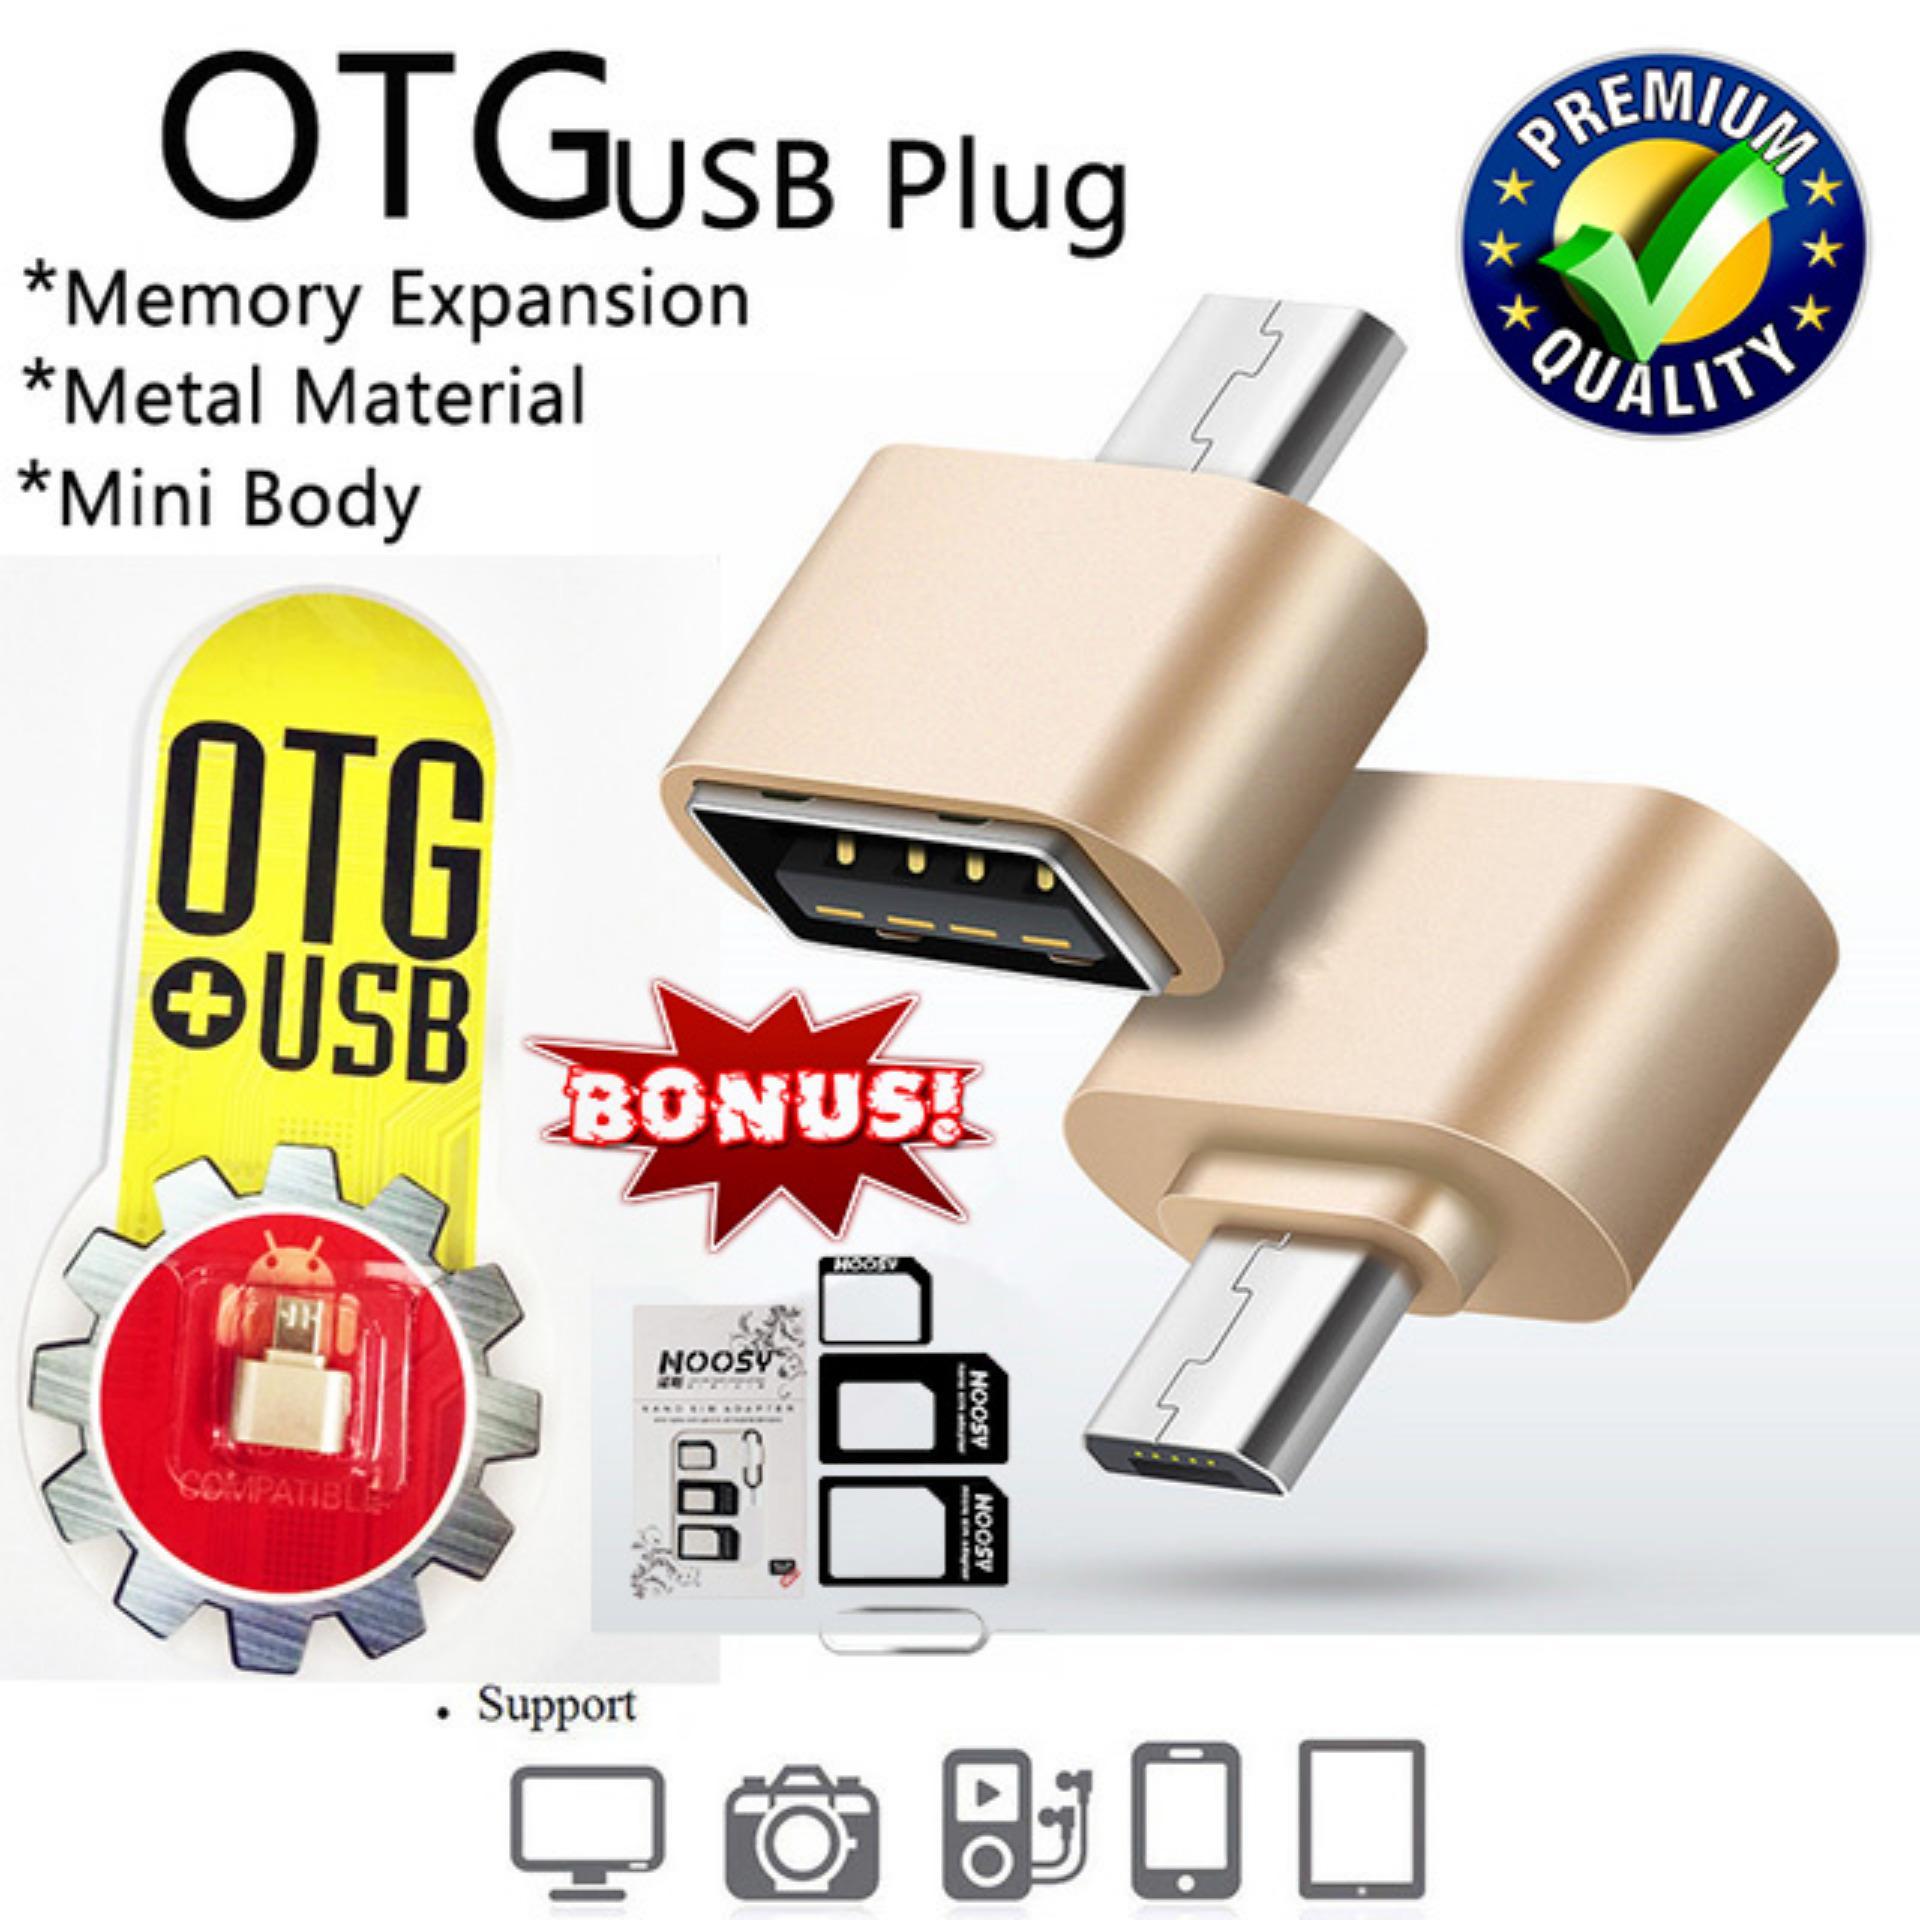 Harga Penawaran Trends Mini Micro Usb Otg Data Cable Adapter 20 Nossy Sim Card Hub Converter For Android Smartphone Samsung Galaxy